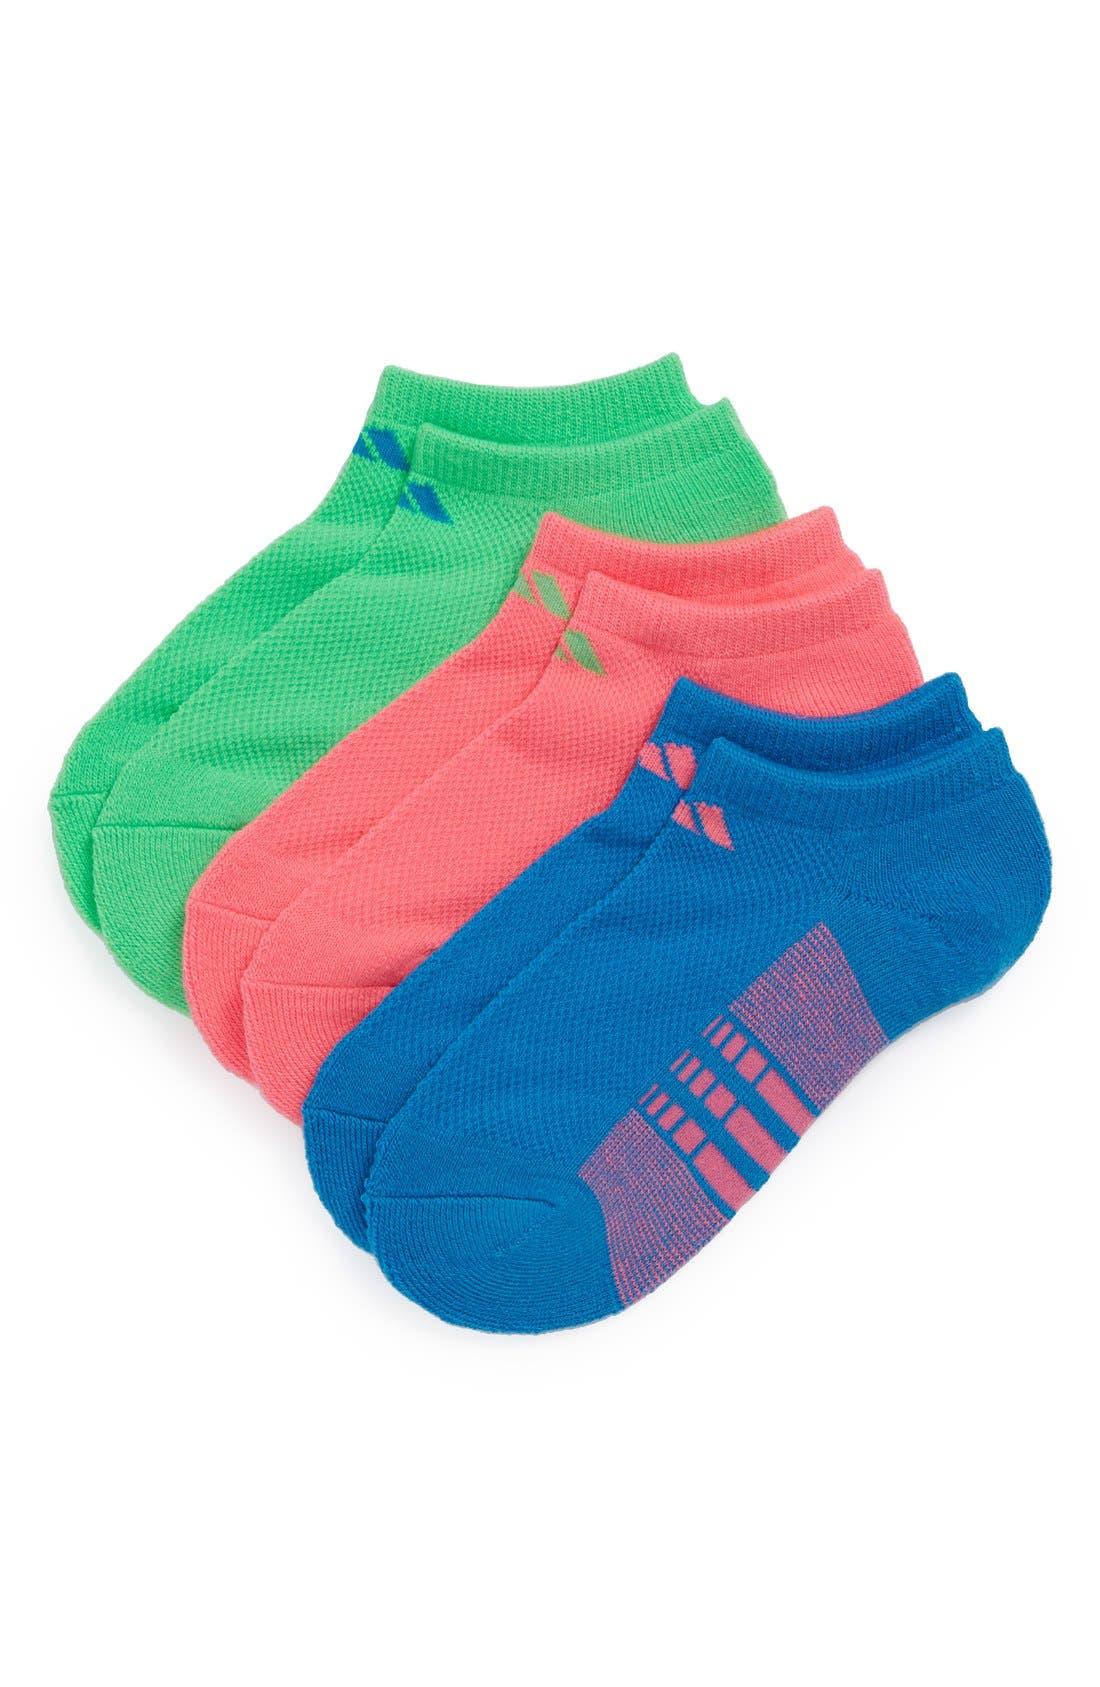 Alternate Image 1 Selected - adidas Cushioned No-Show Socks (3-Pack) (Little Kid & Big Kid)